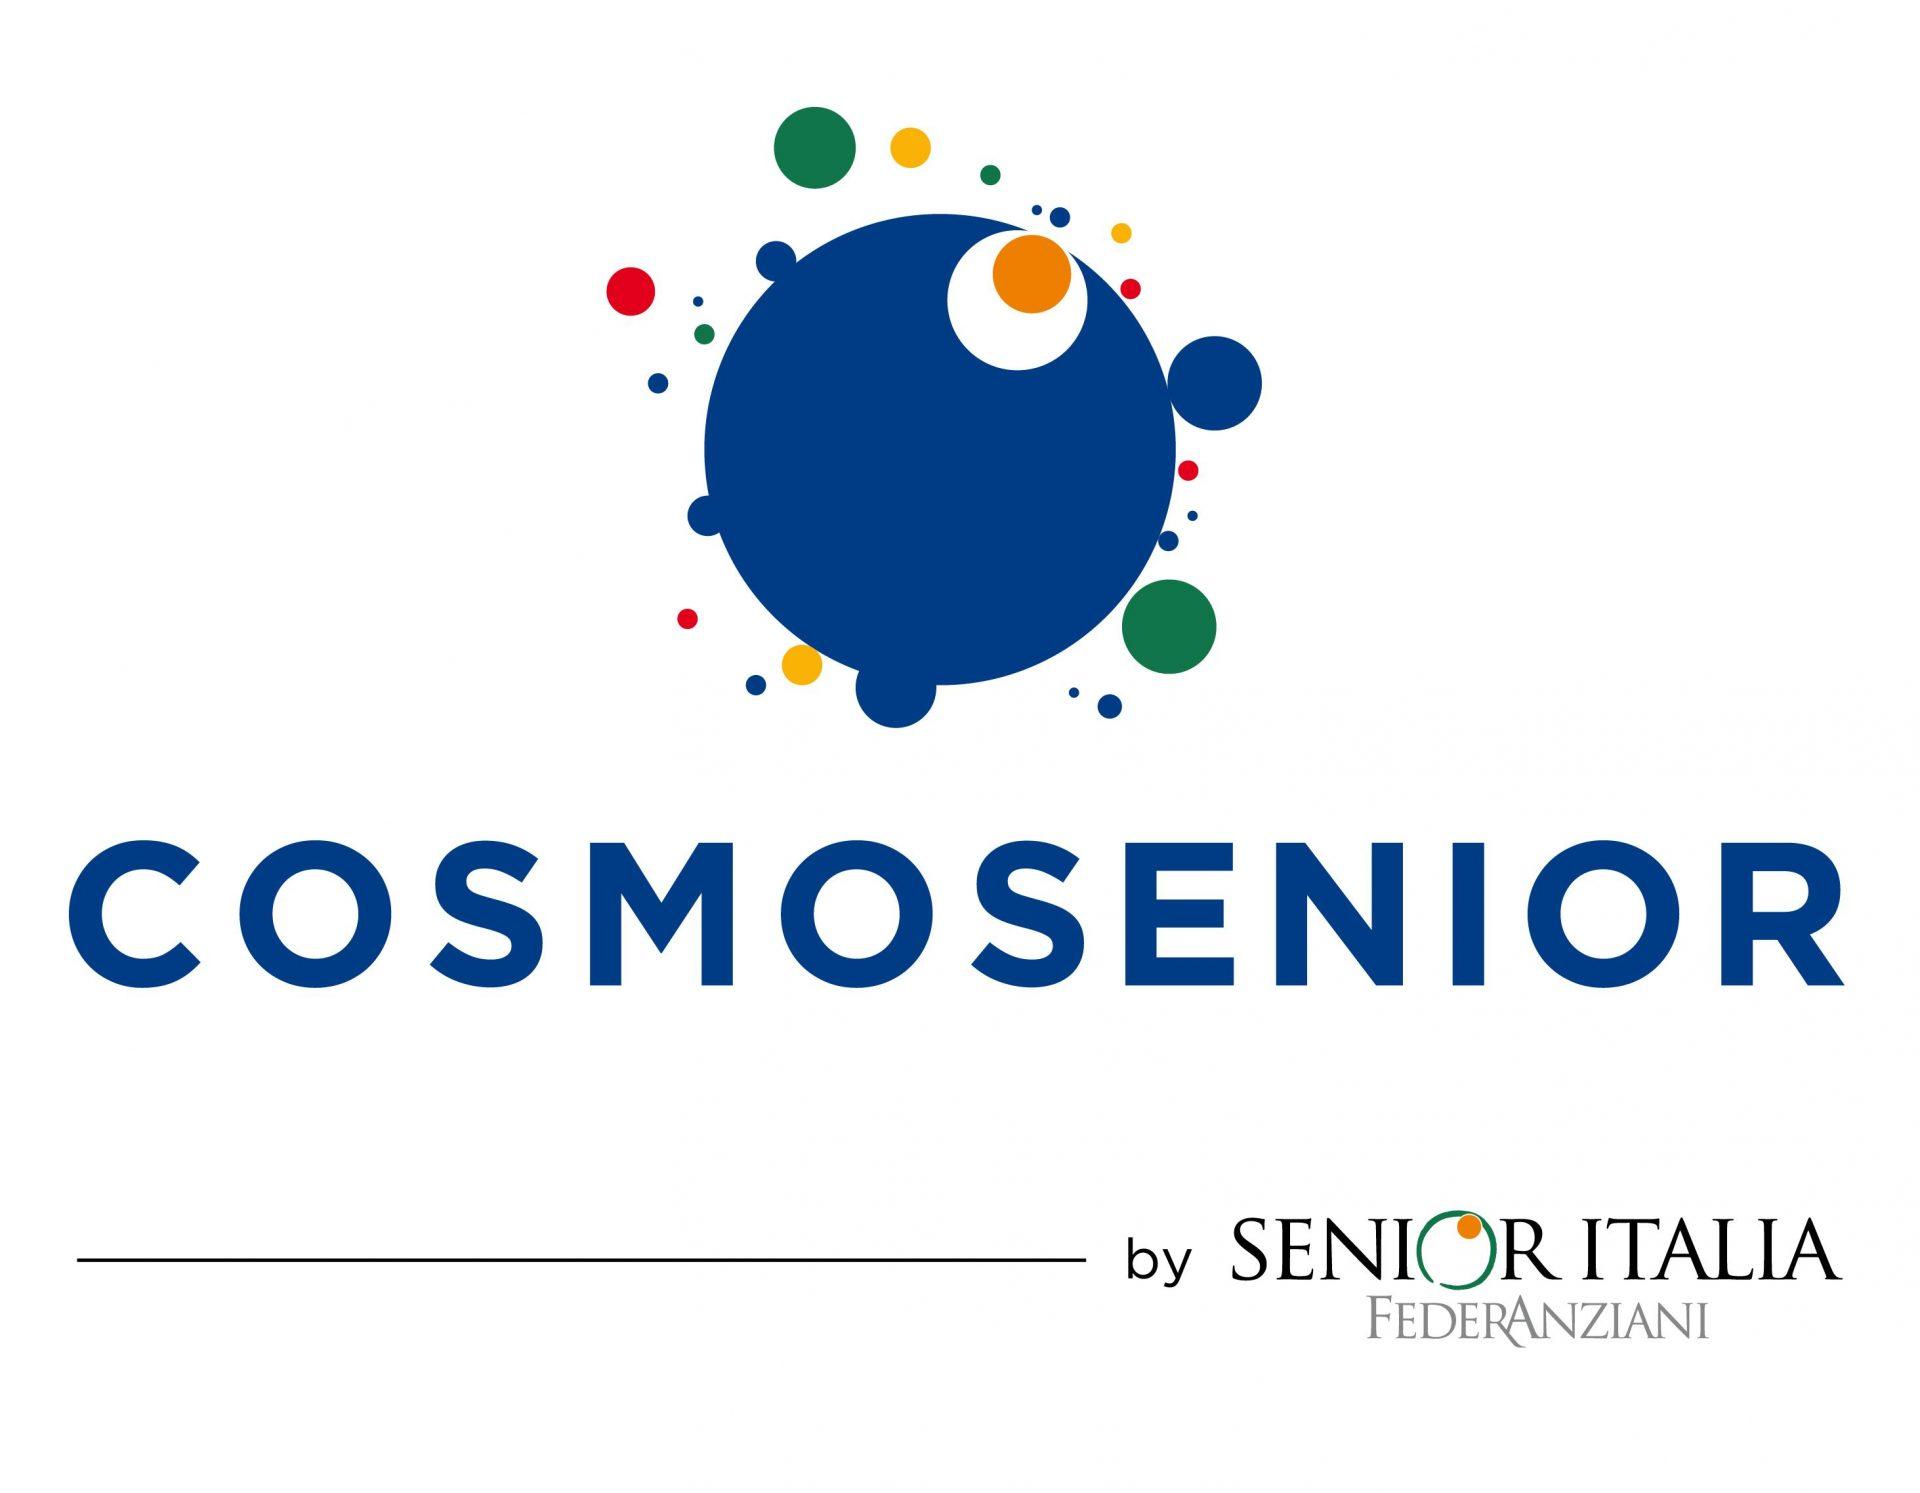 cosmosenior